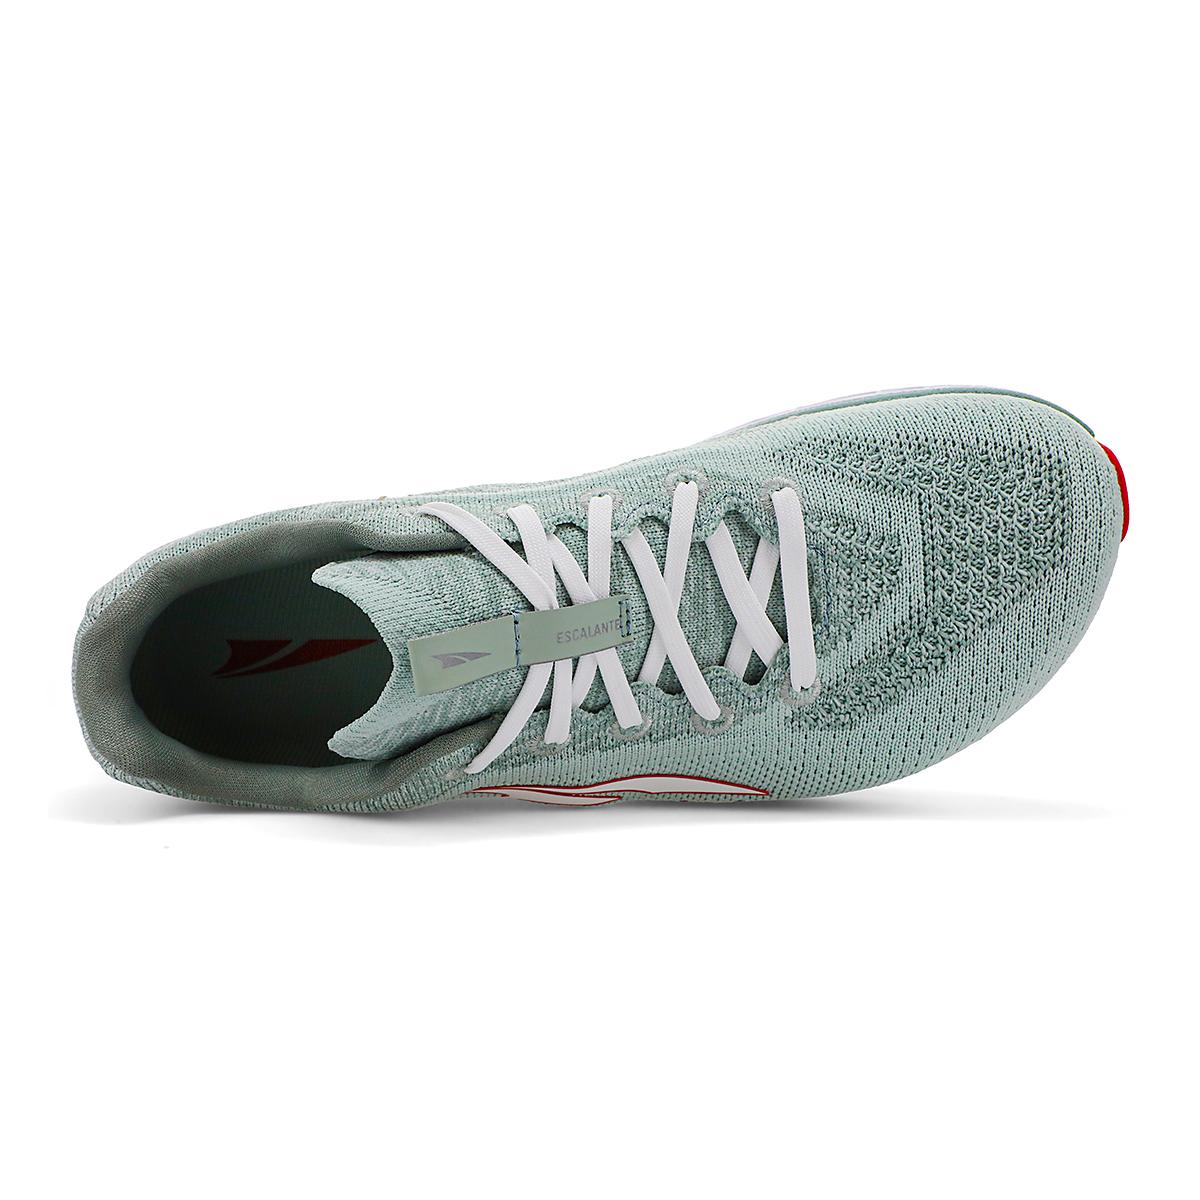 Women's Altra Escalante 2.5 Running Shoe - Color: Light Green - Size: 5.5 - Width: Regular, Light Green, large, image 3